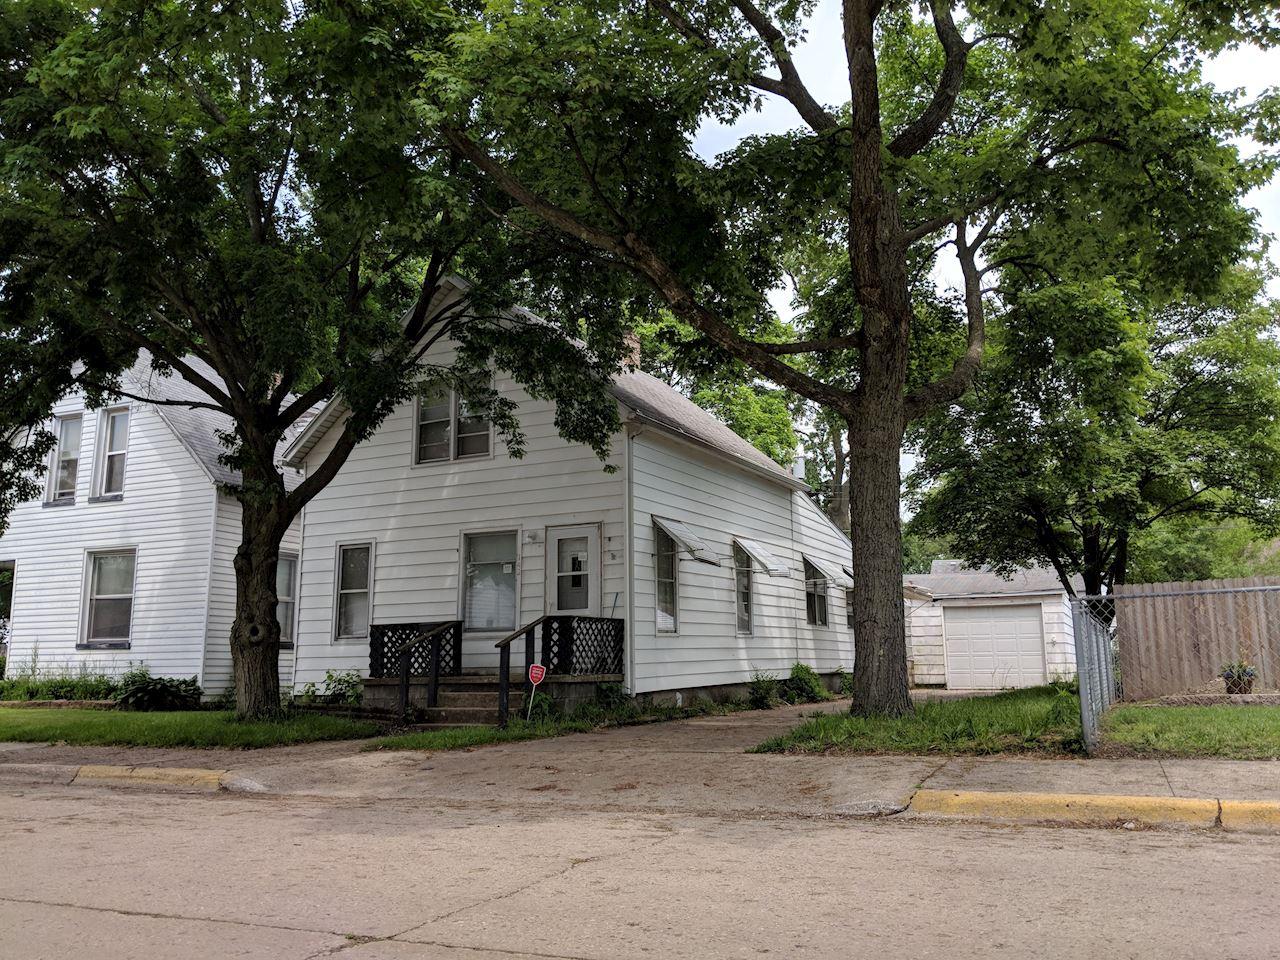 investment property - 142 Jackson St, Michigan City, IN 46360, La Porte - image 1